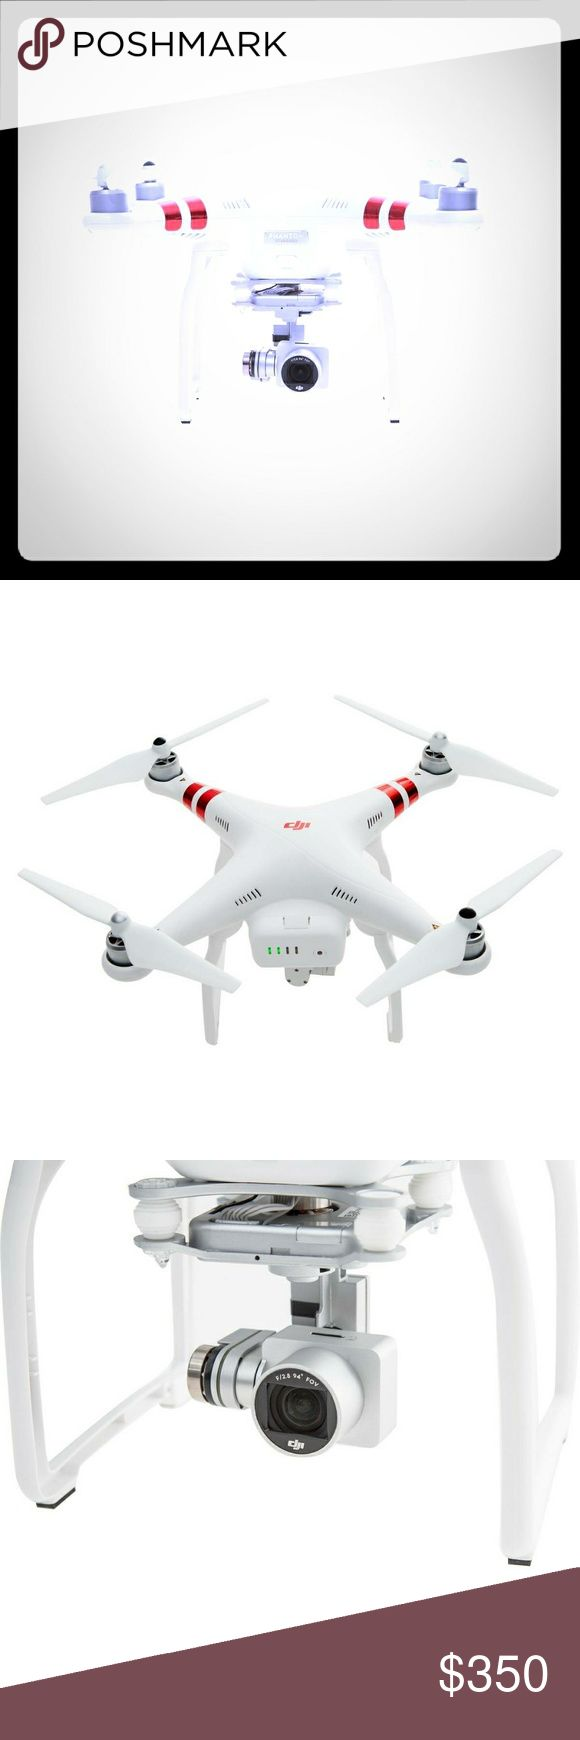 DJI PHANTOM DRONE STANDARD 3 BRAND NEW (NVR FLEW/ NVR USED) DJI PHANTOM Other